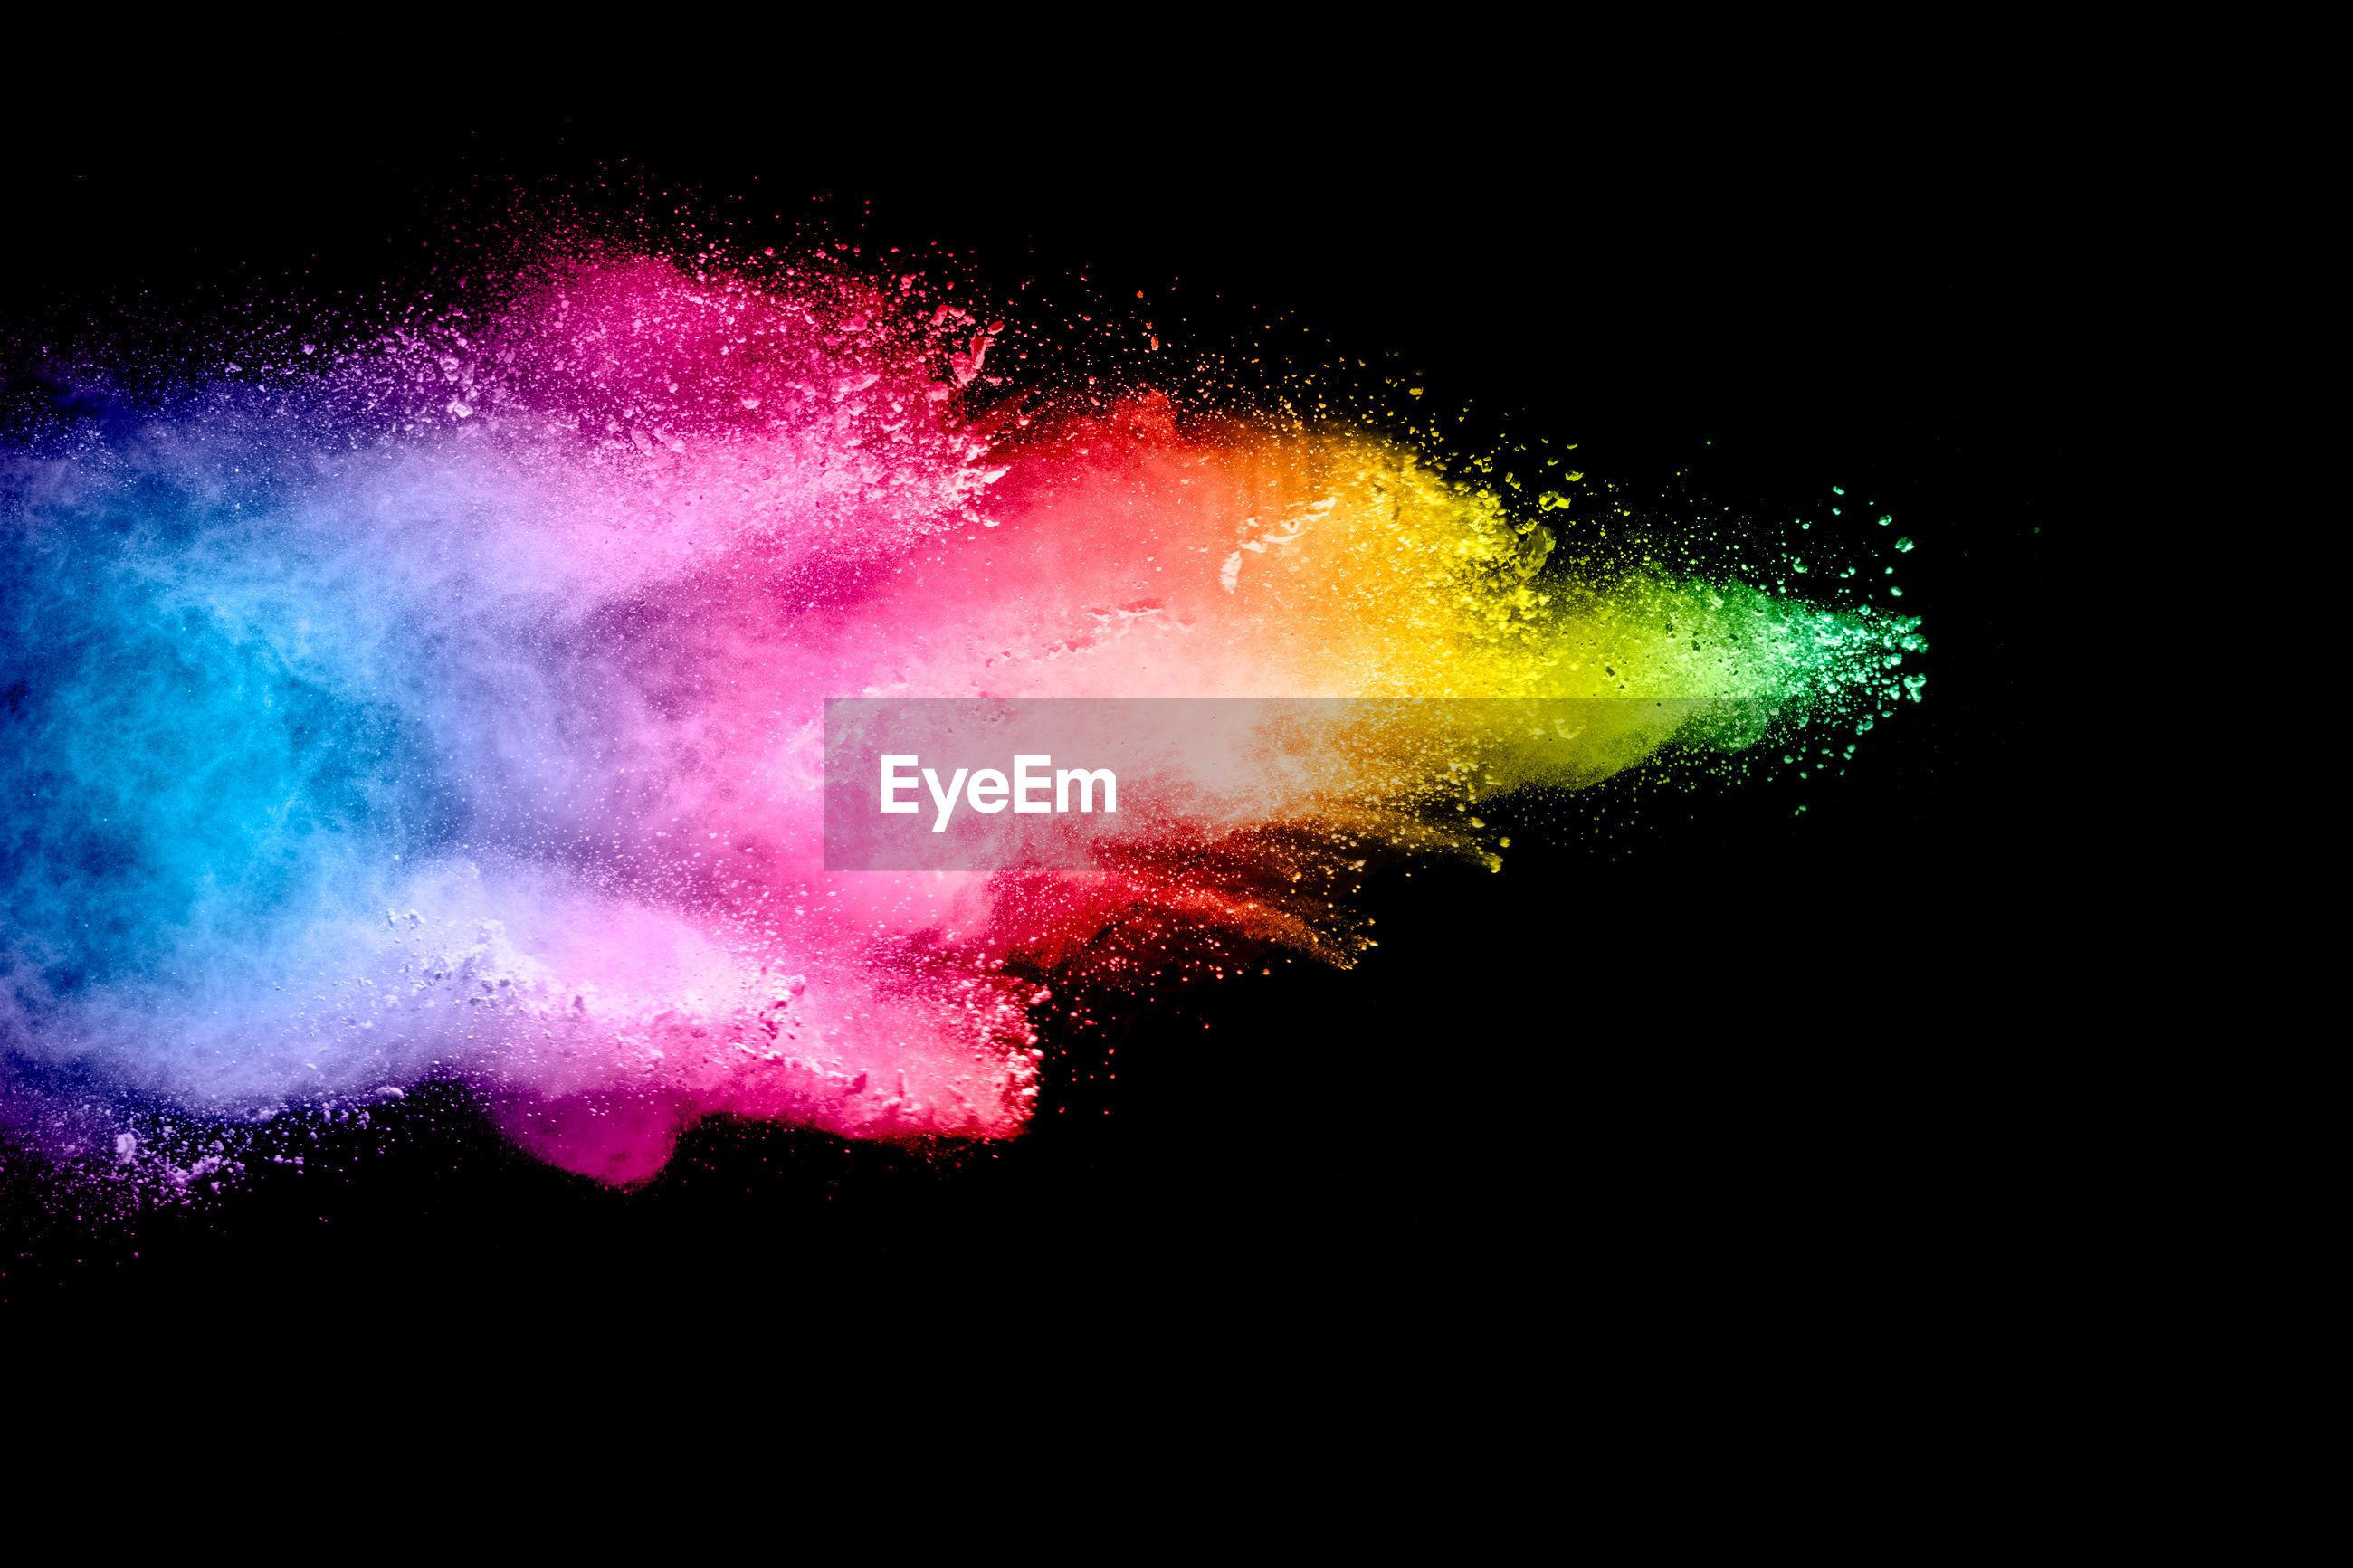 Colorful powder paint against black background